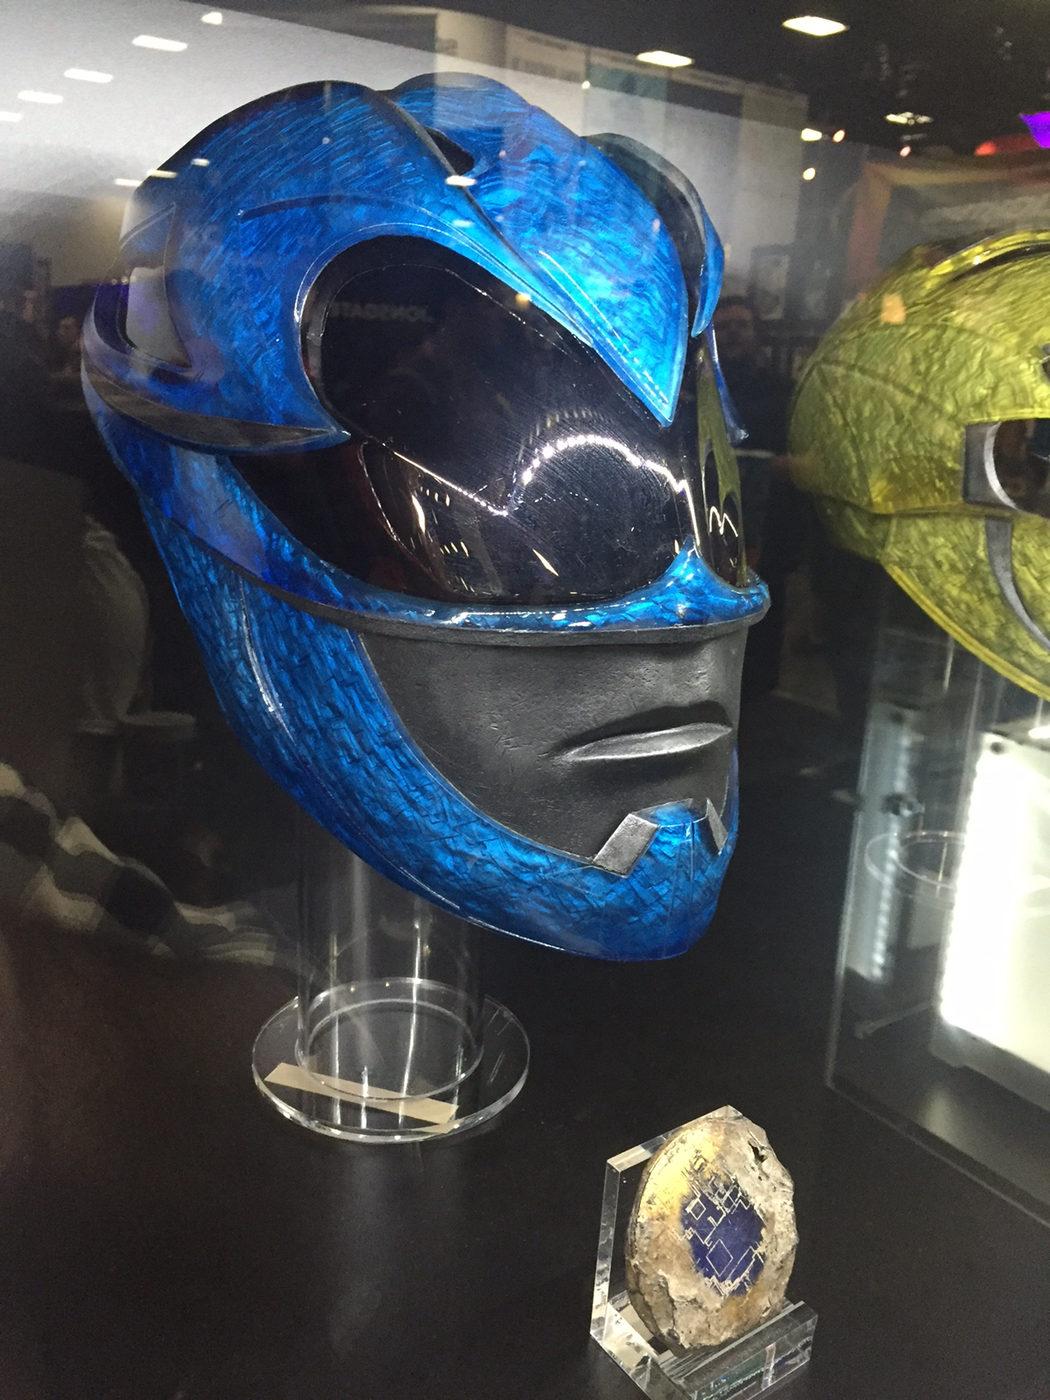 Casco y moneda de poder del ranger azul